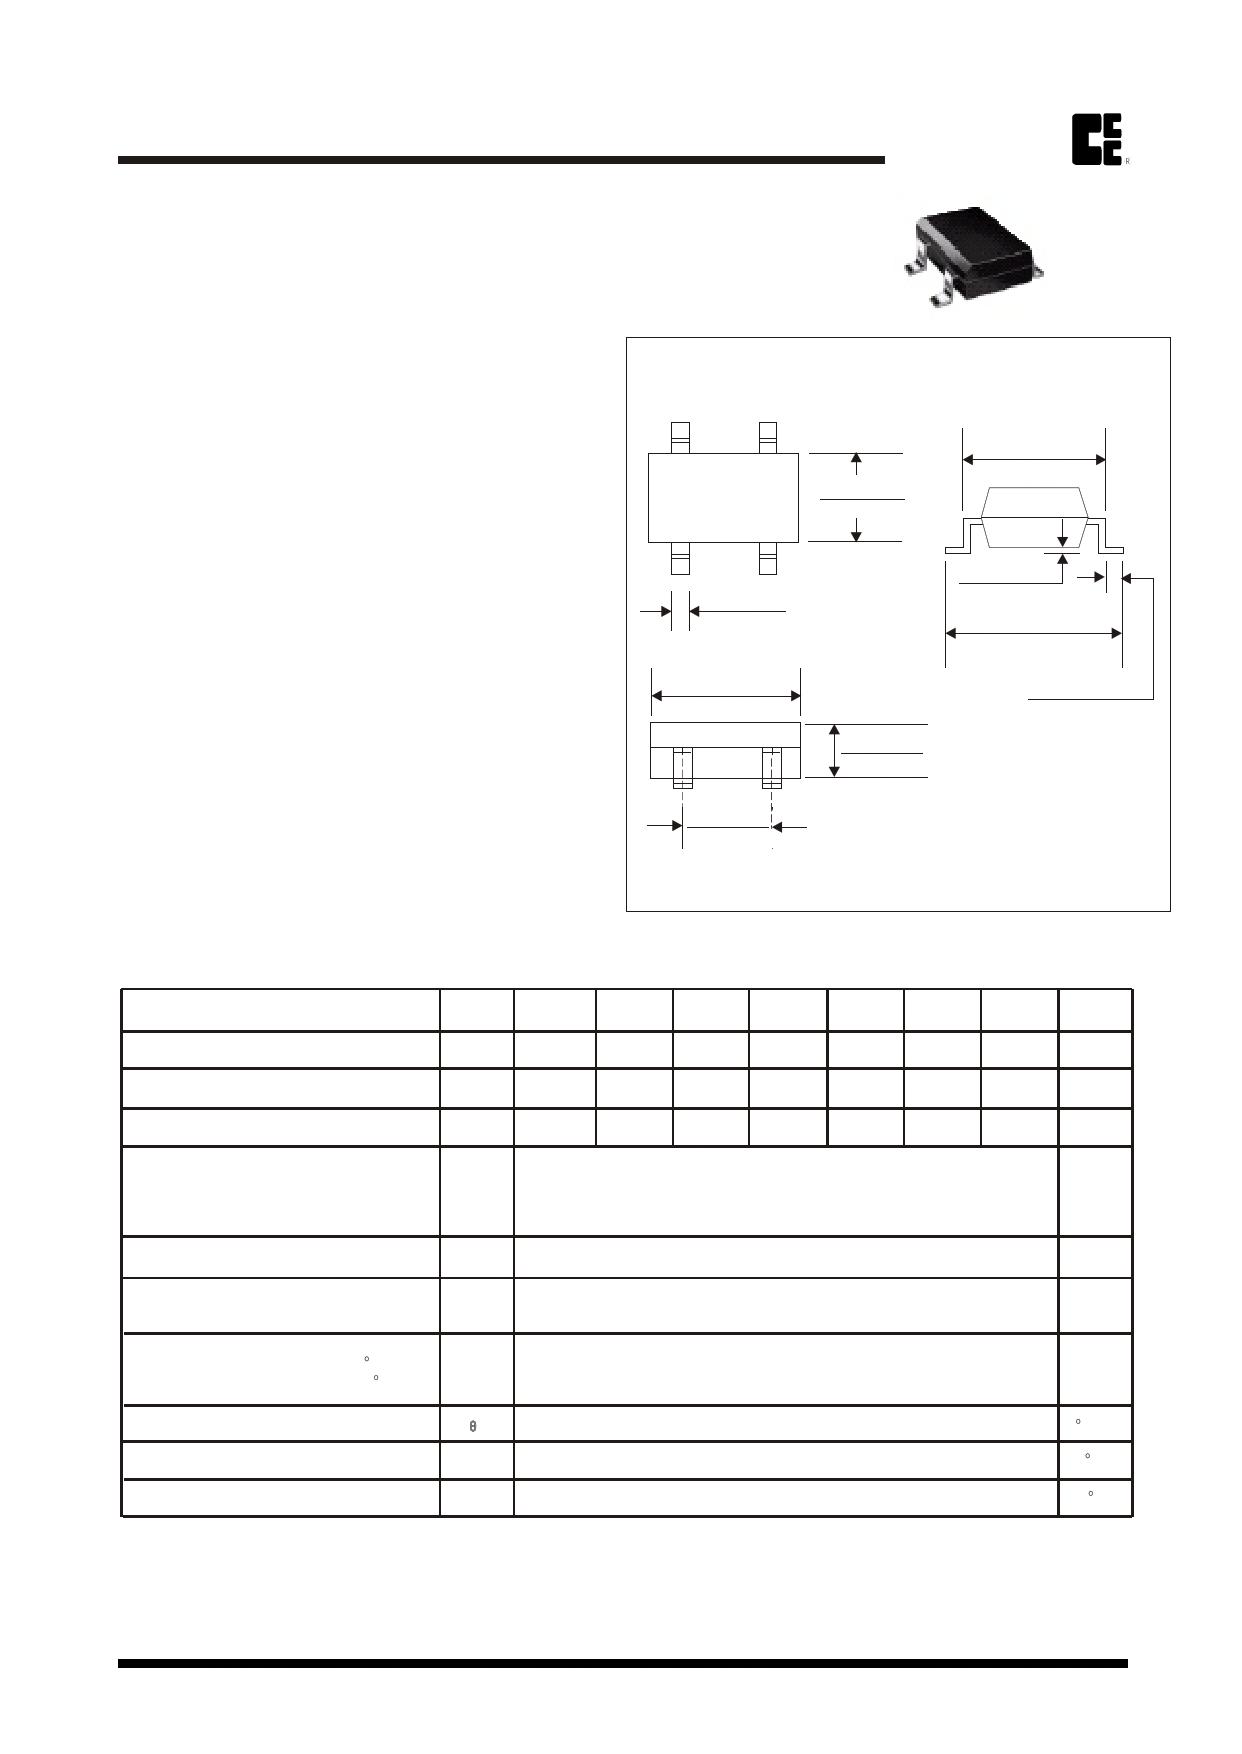 DF15005S даташит PDF